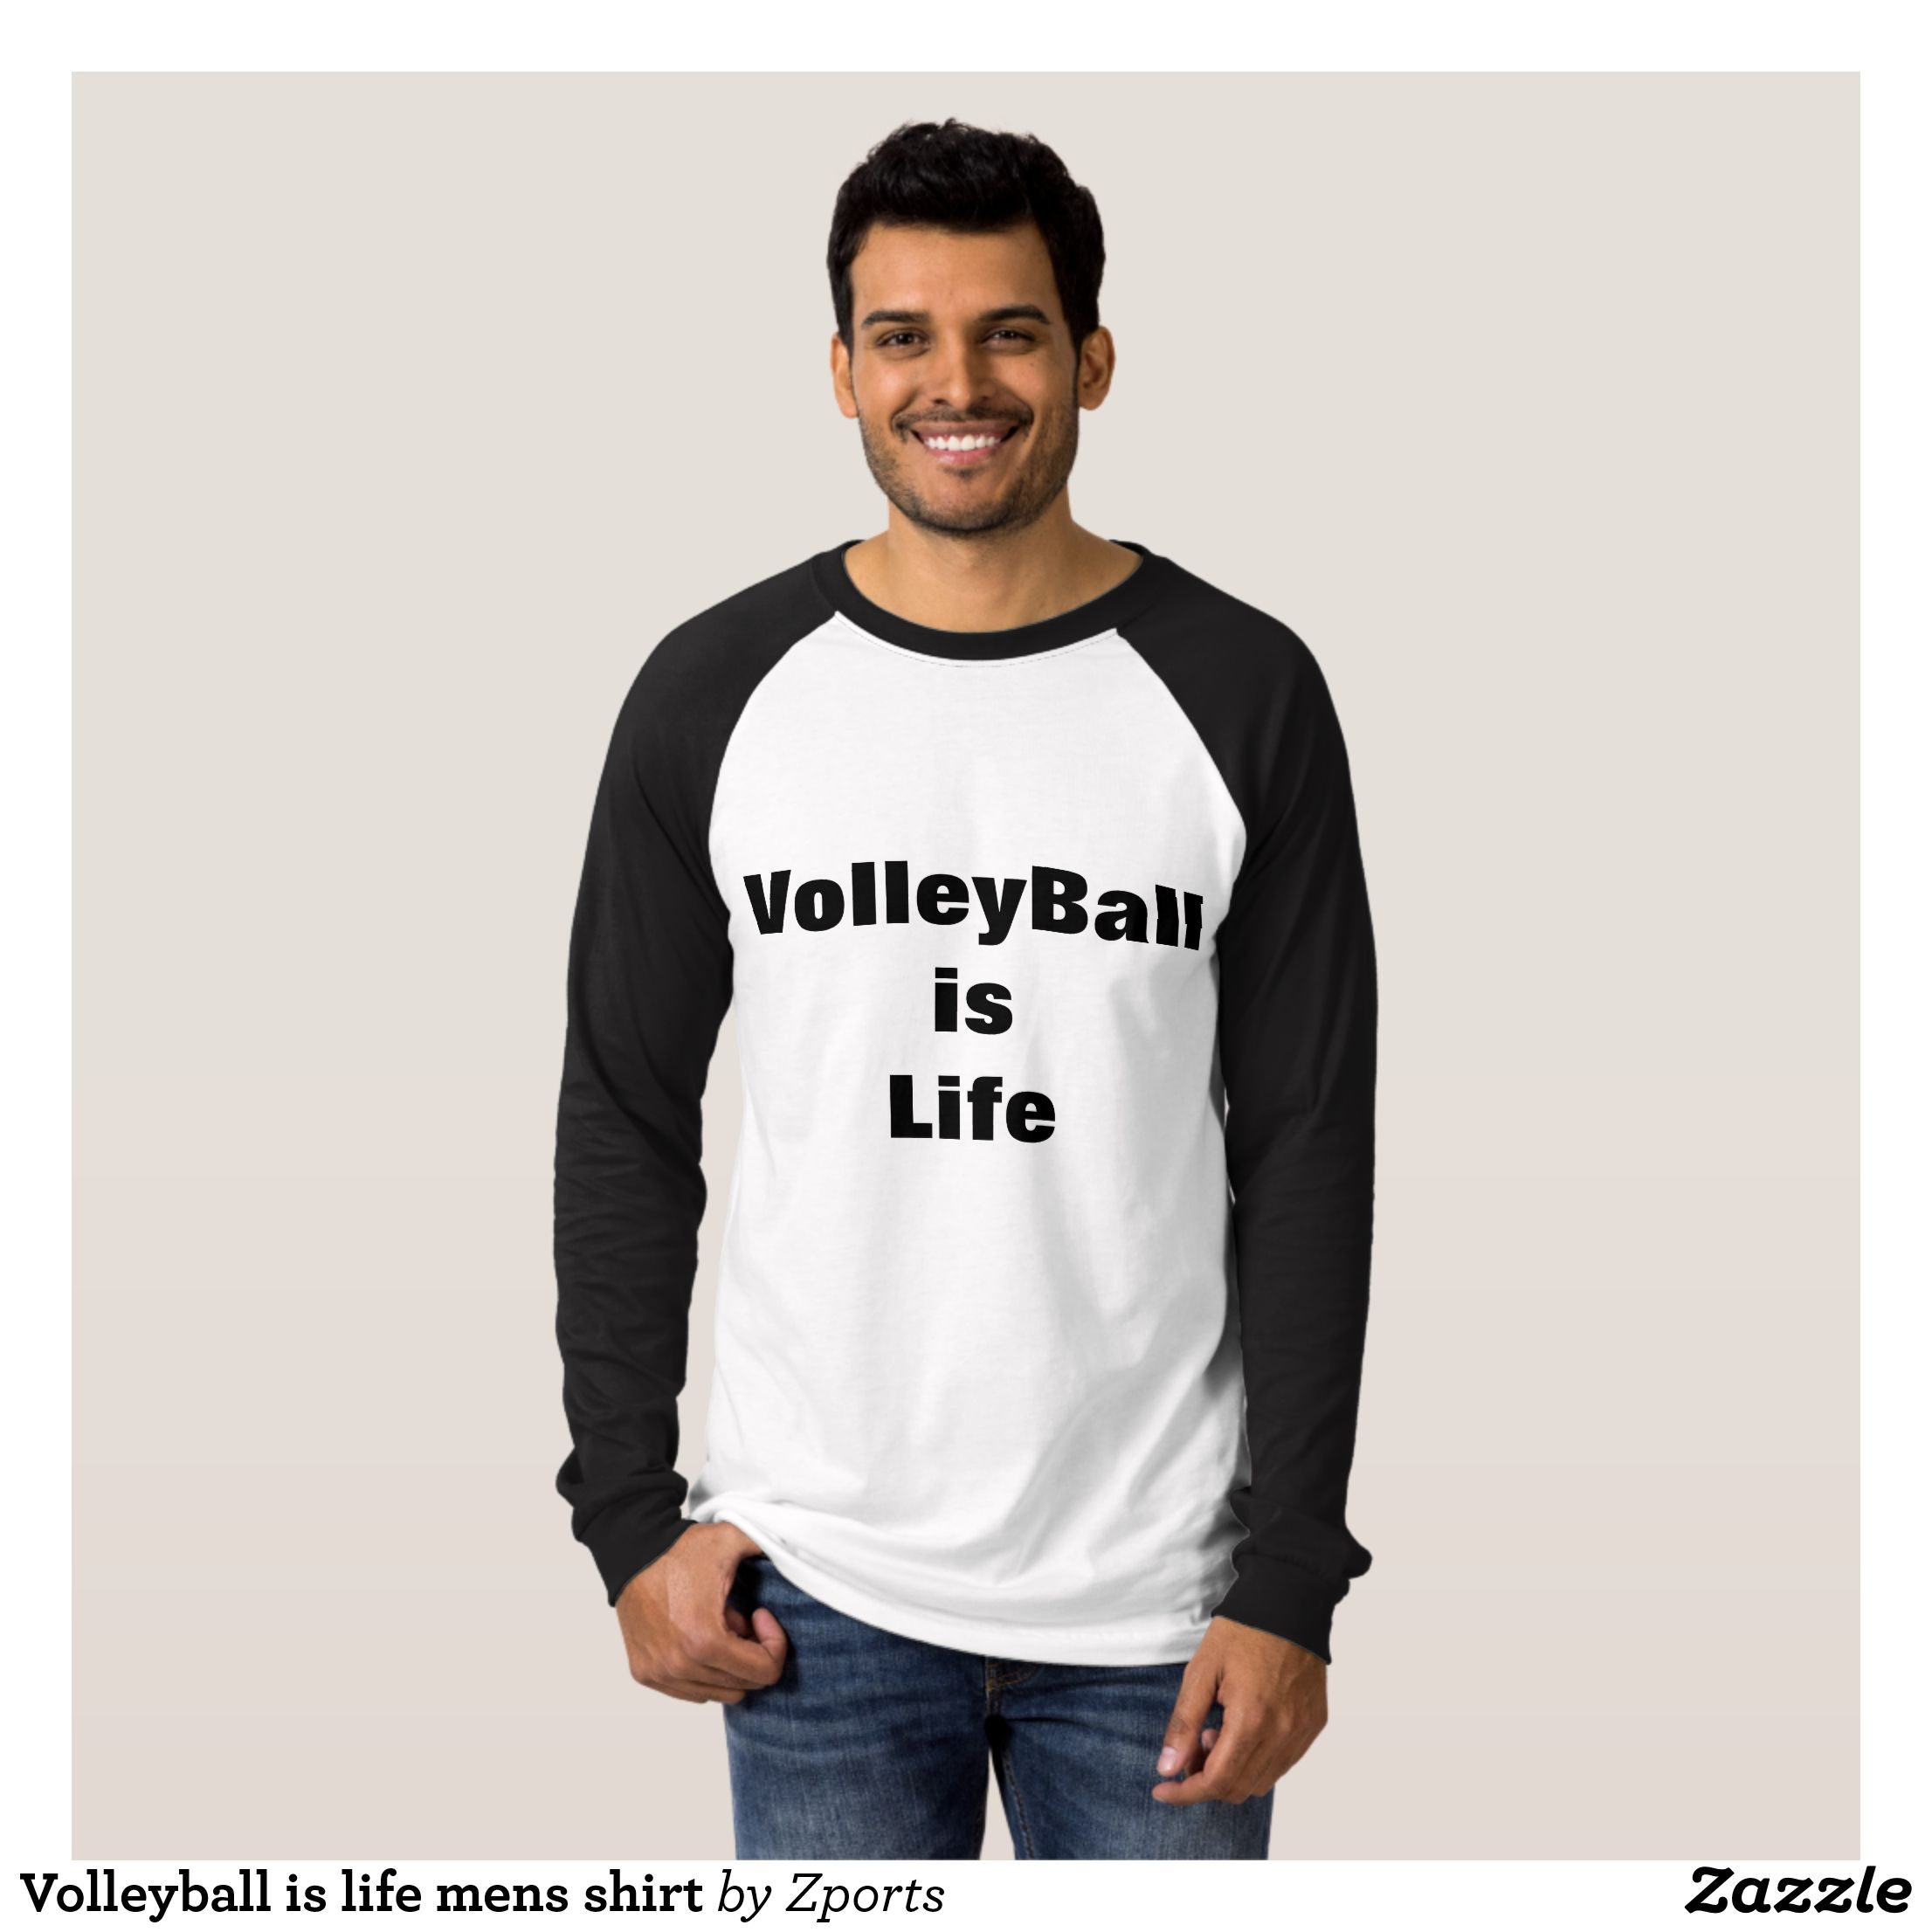 Volleyball Is Life Mens Shirt Heavyweight Pre Shrunk Shirts By Talented Fashion Graphic Designers Sweatsh Silver T Shirts Cartoon T Shirts Shirt Designs